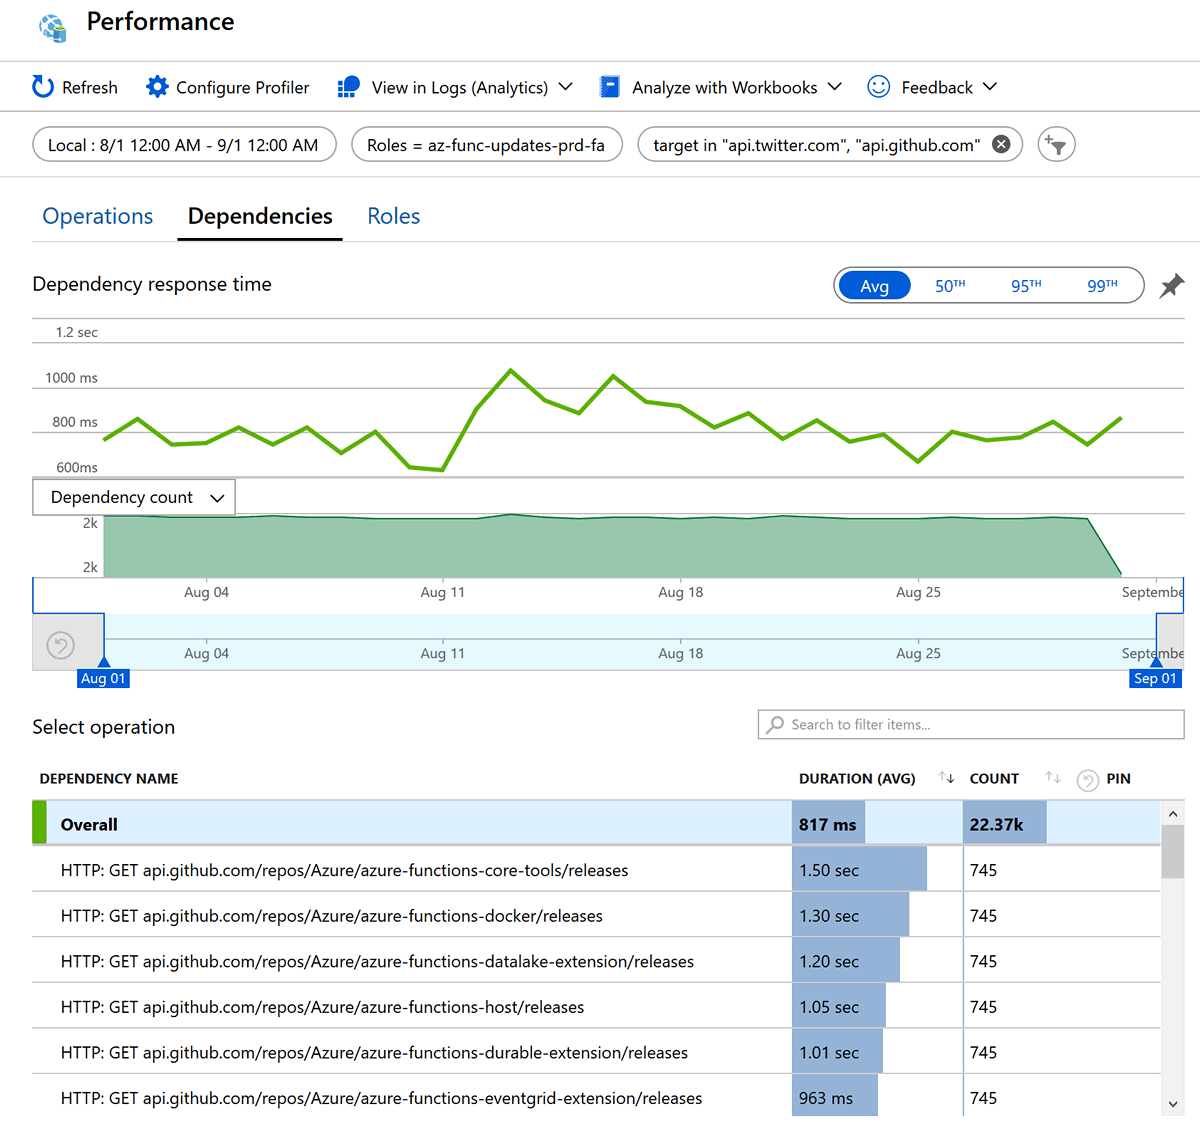 Average duration HTTP APIs